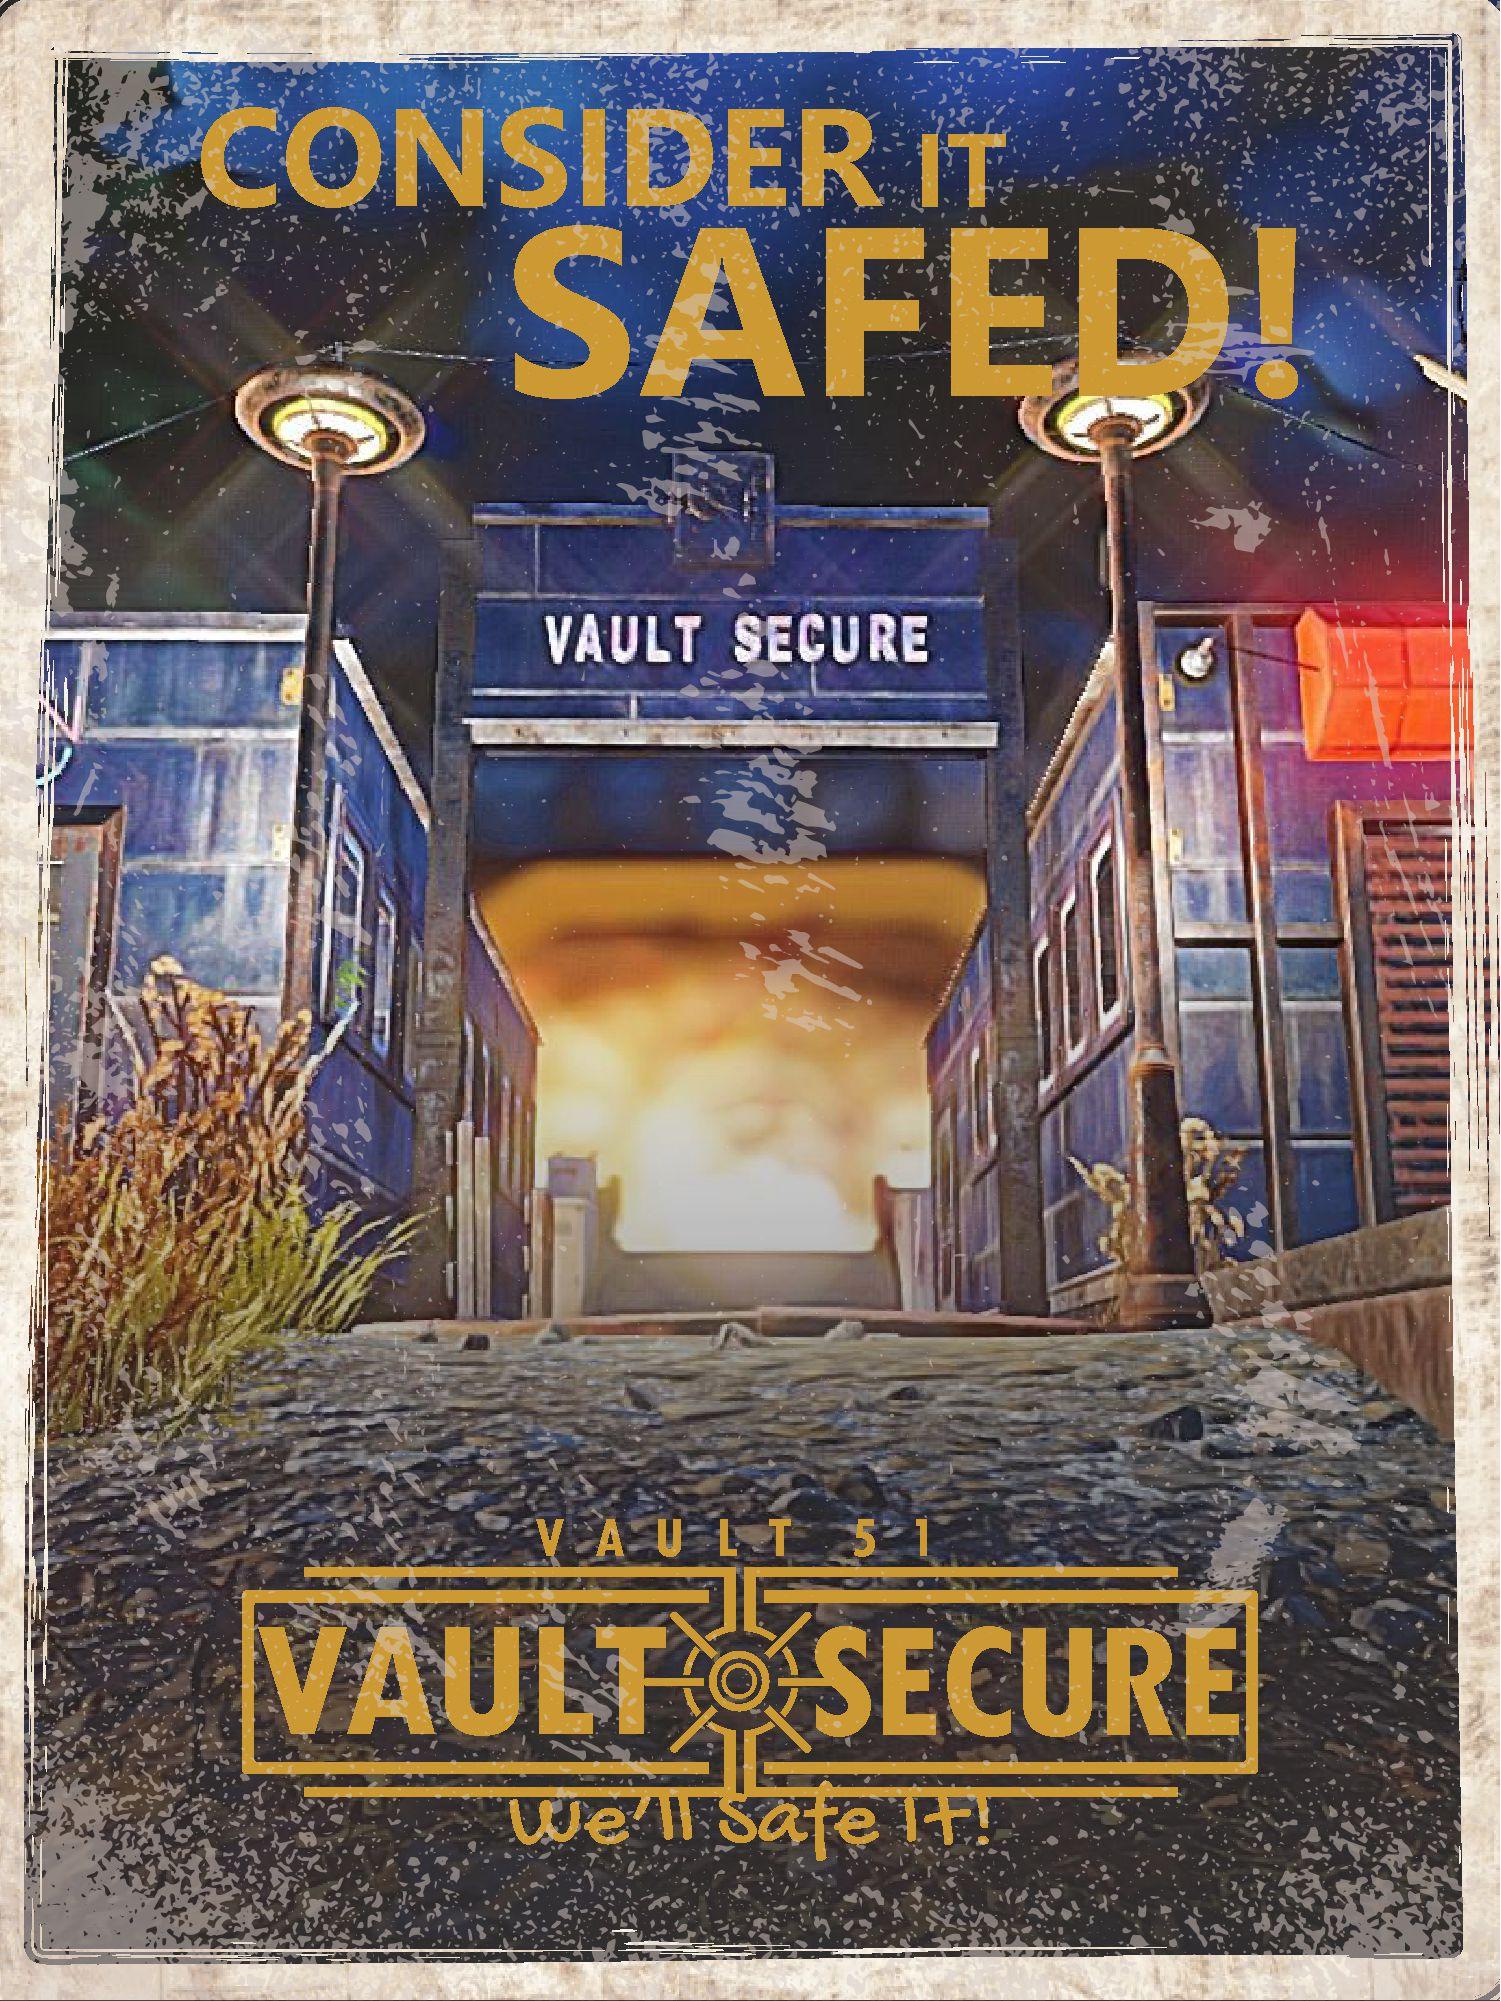 Vault Secure at Vault 51